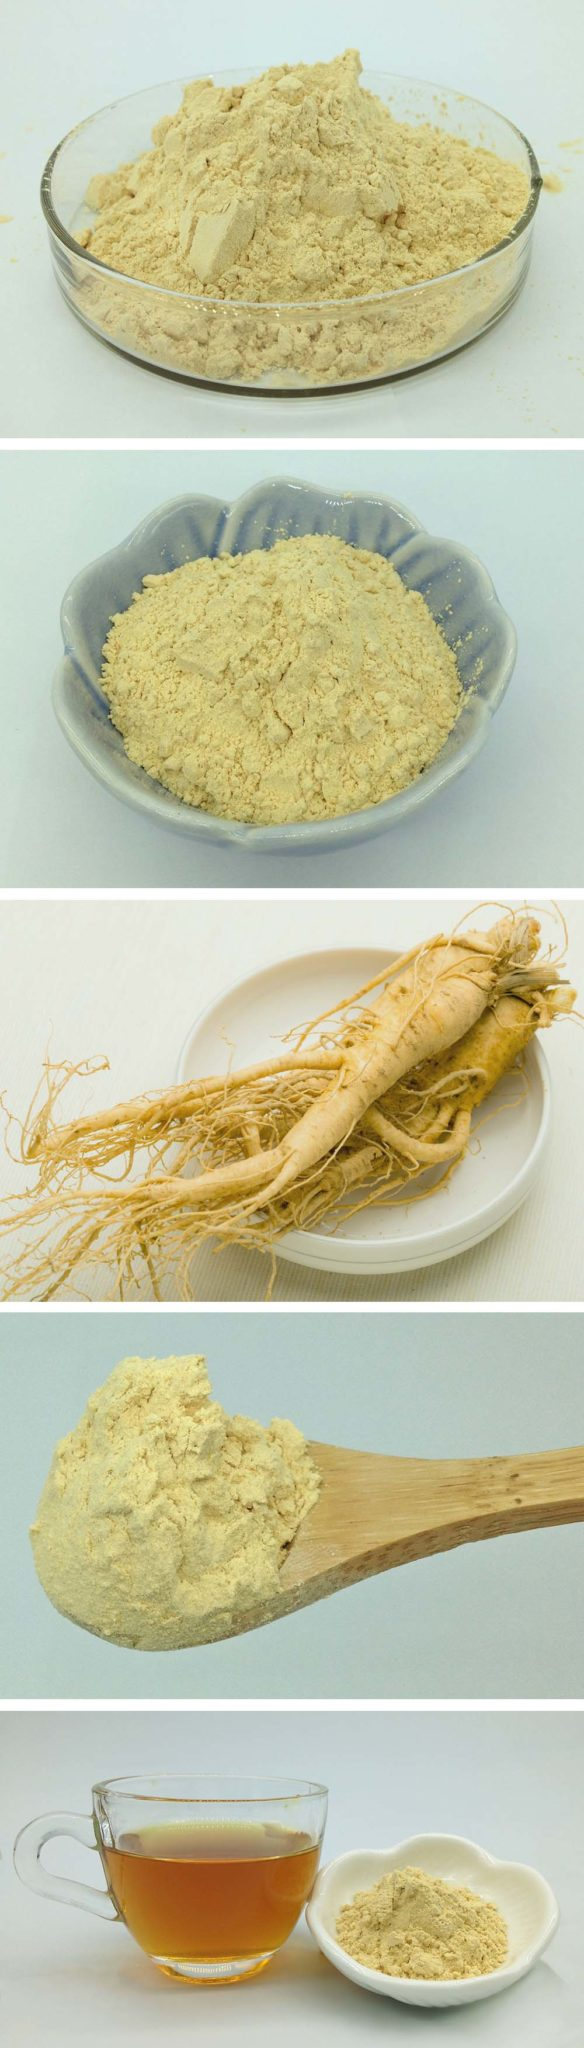 Ginseng Root Extract Powder